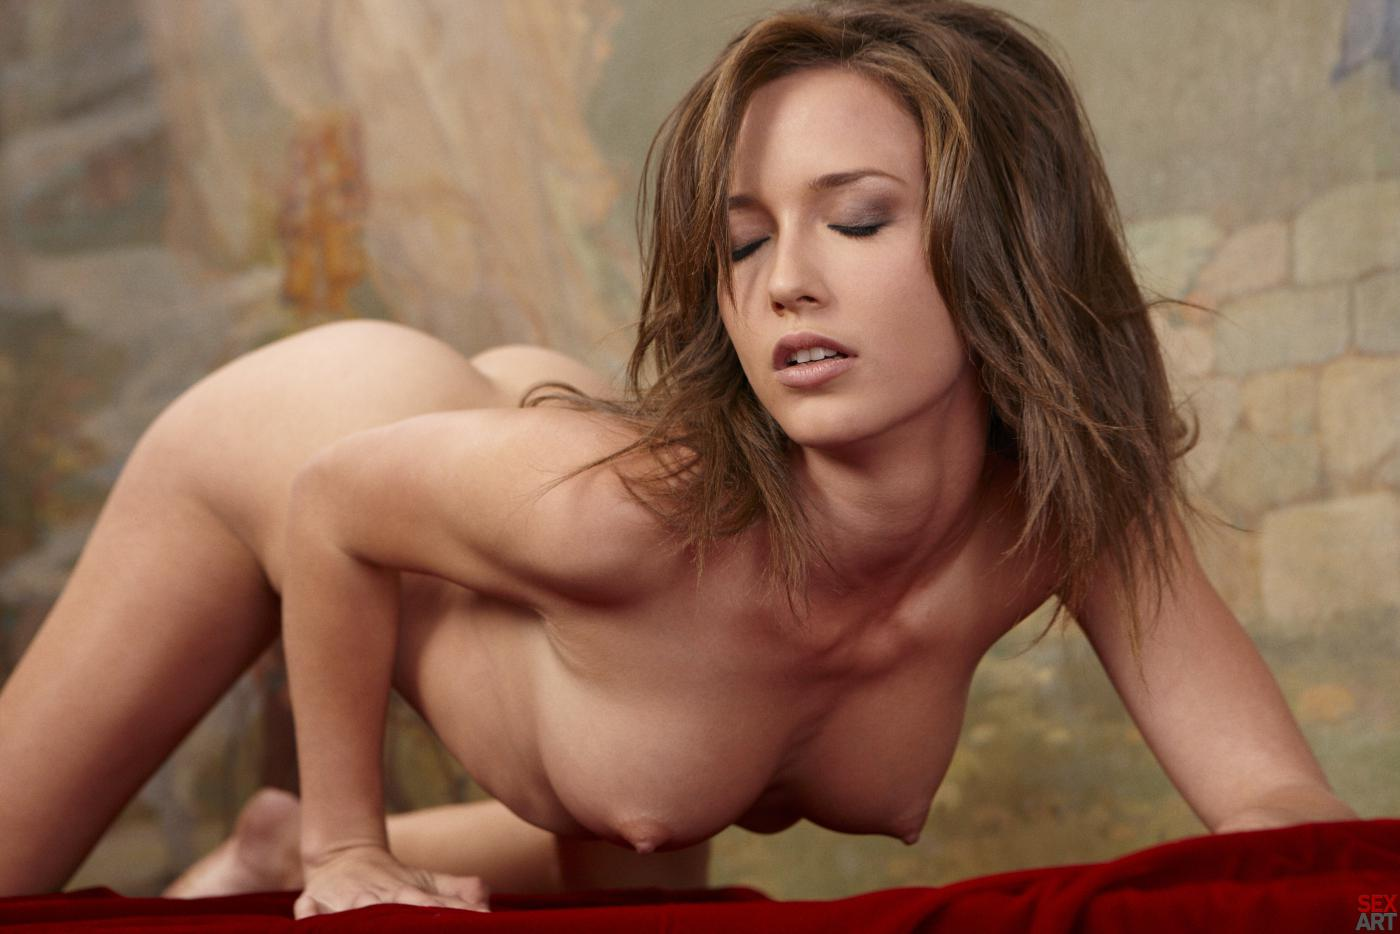 Valerie bertinelli old nude